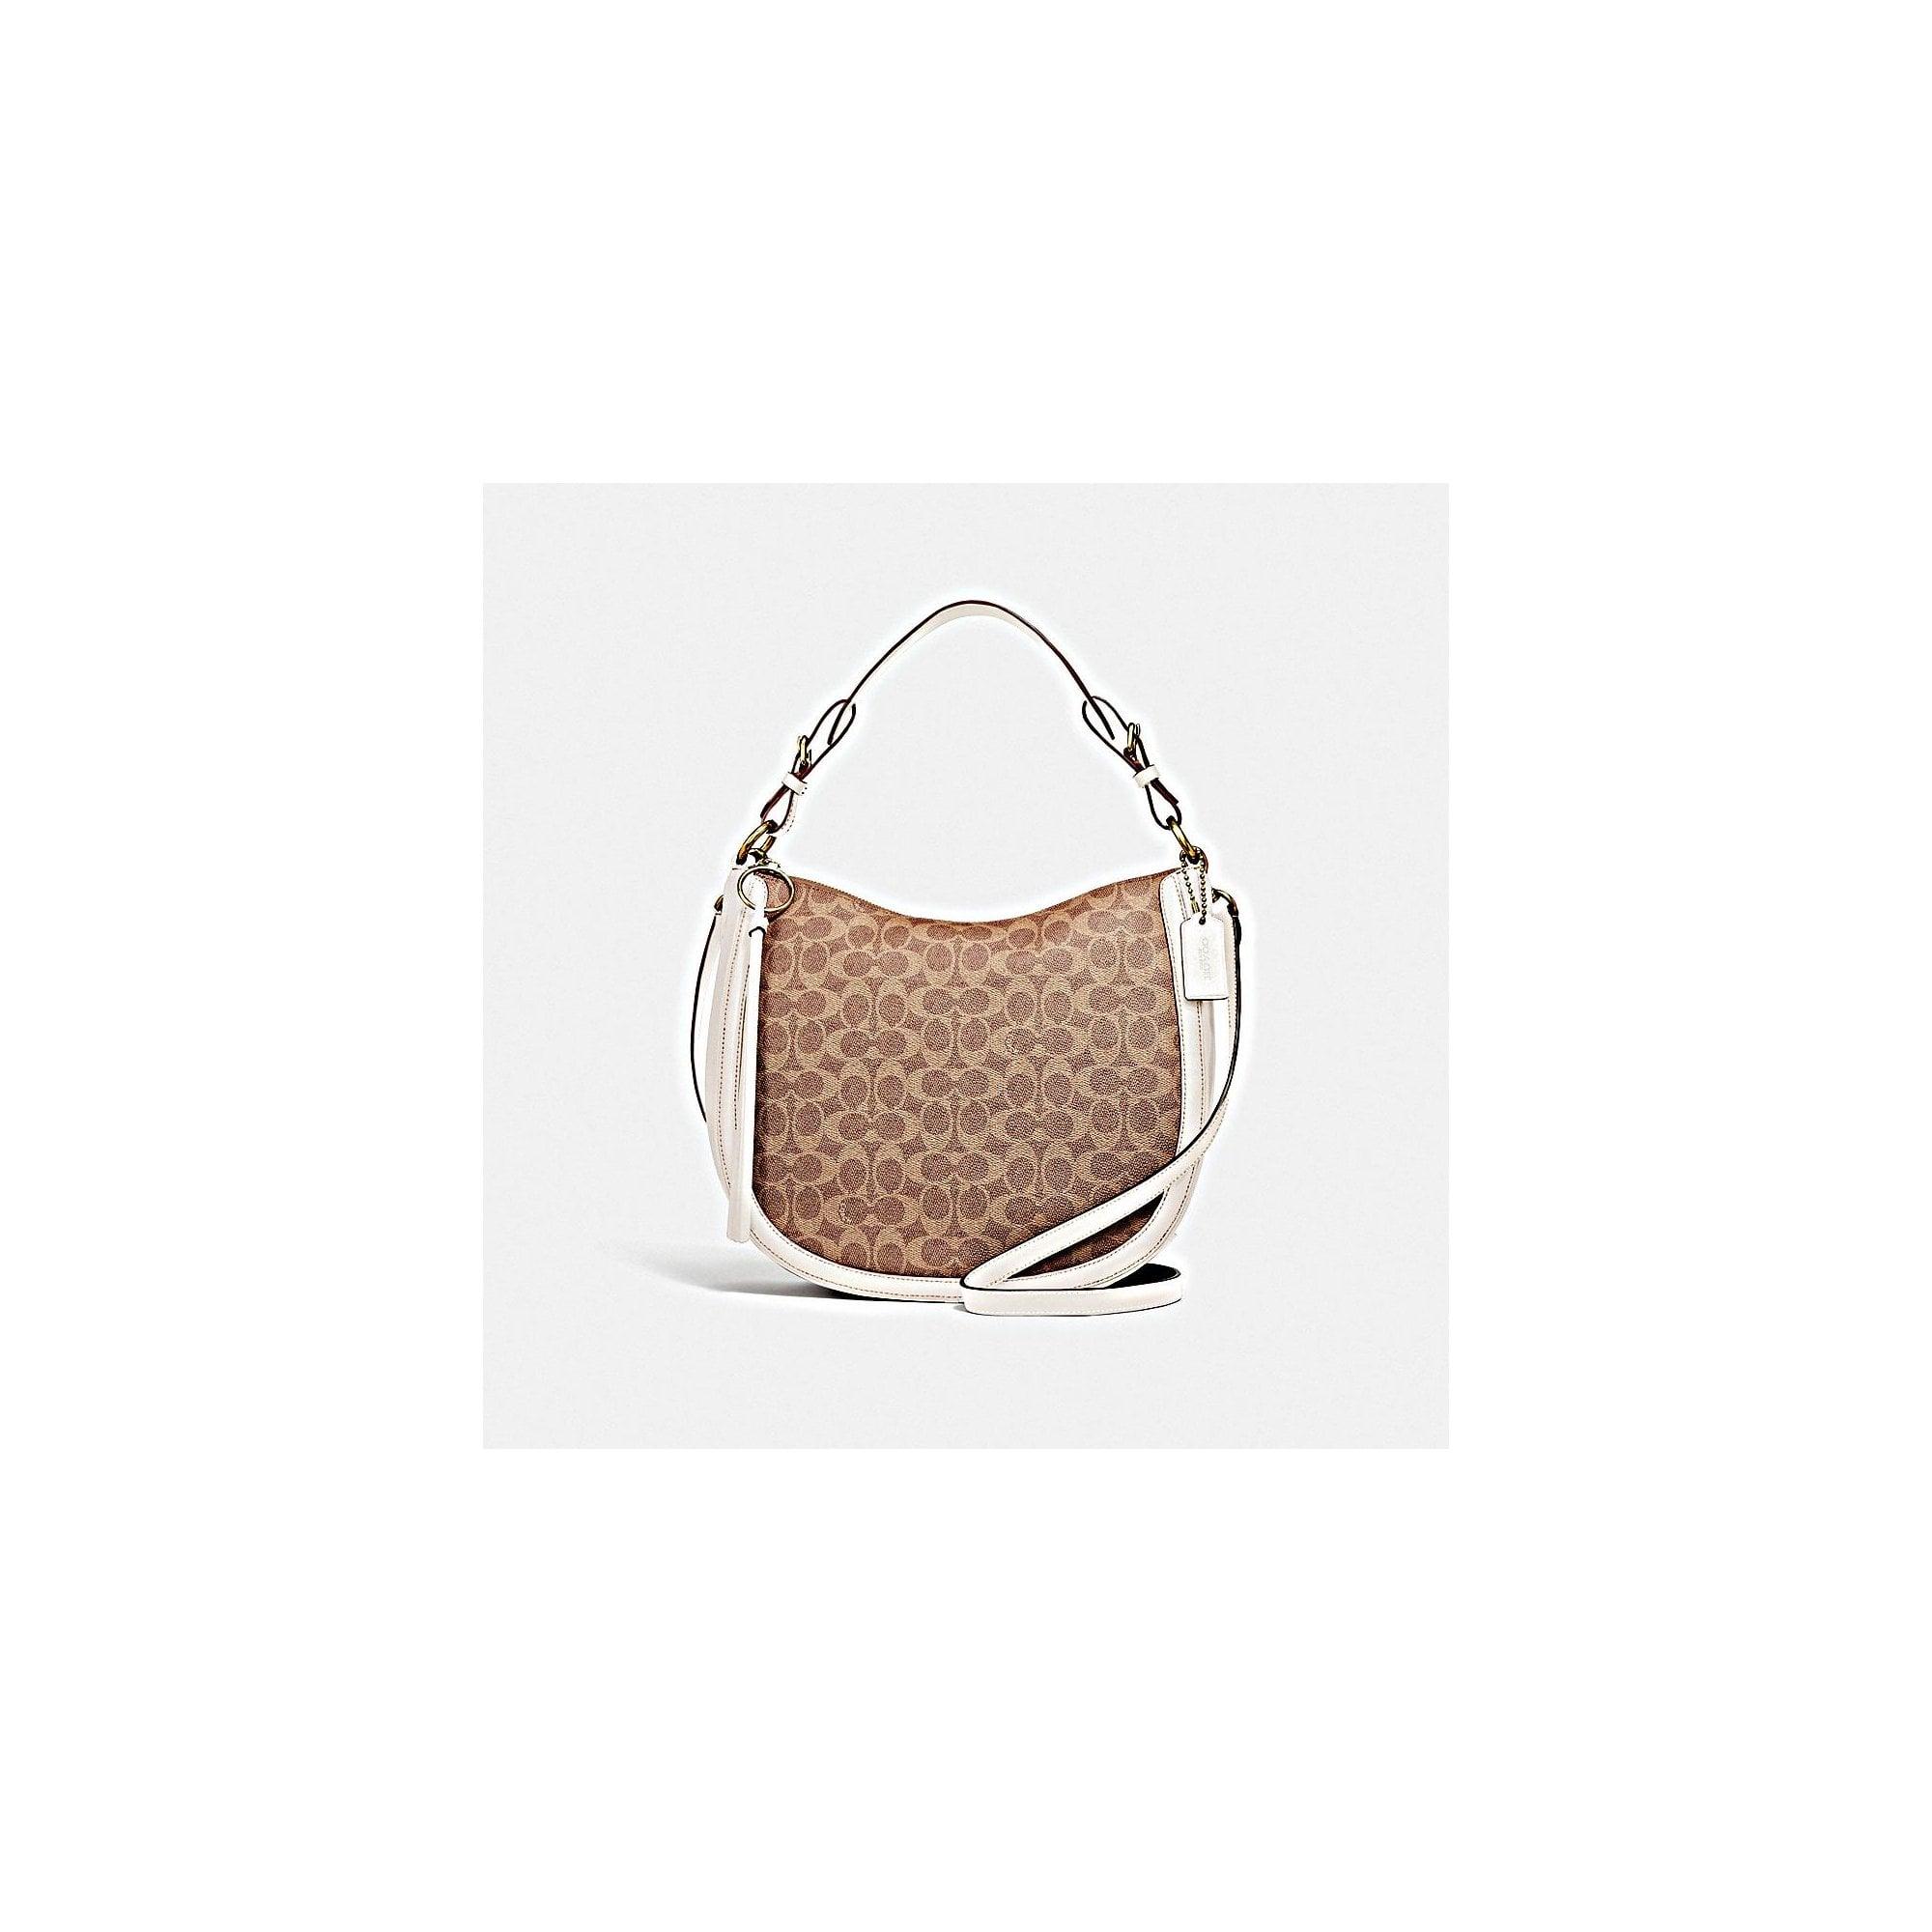 COACH Signature Sutton Hobo Bag in Tan Chalk 6760be1117503